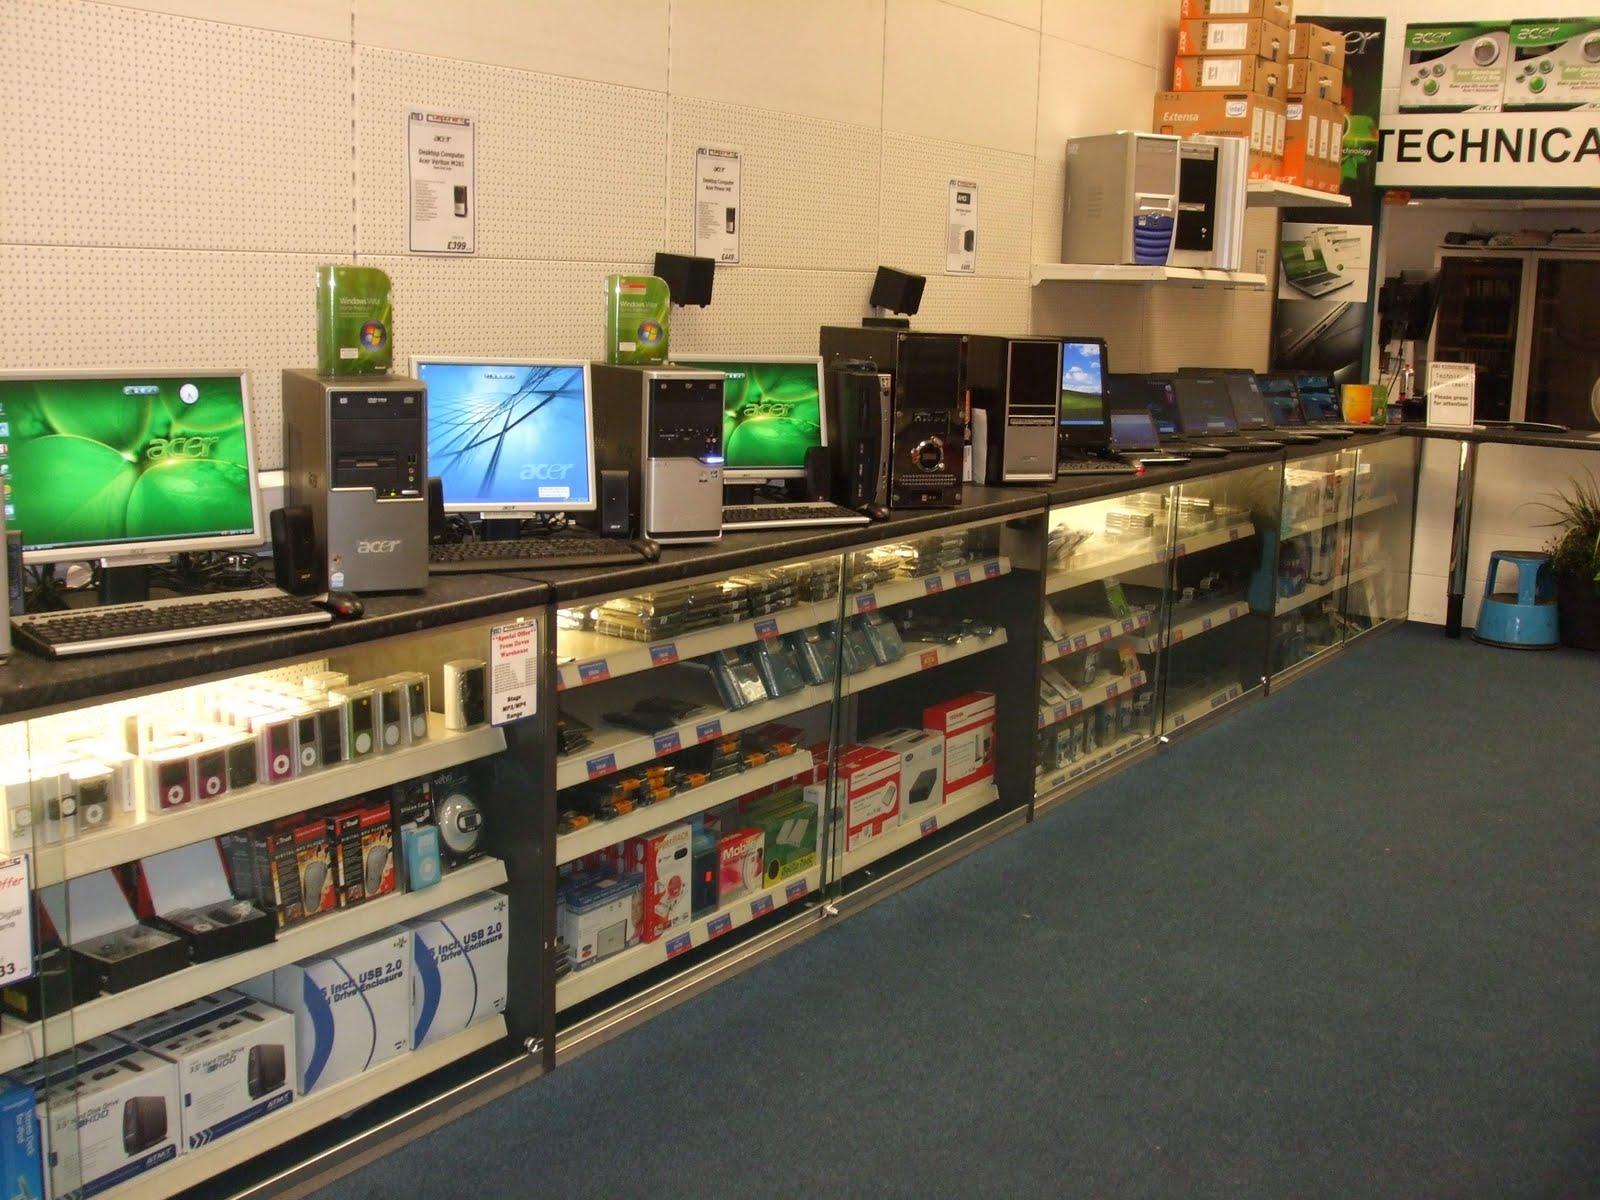 Price, Laptop, Notebook: Laptop parts